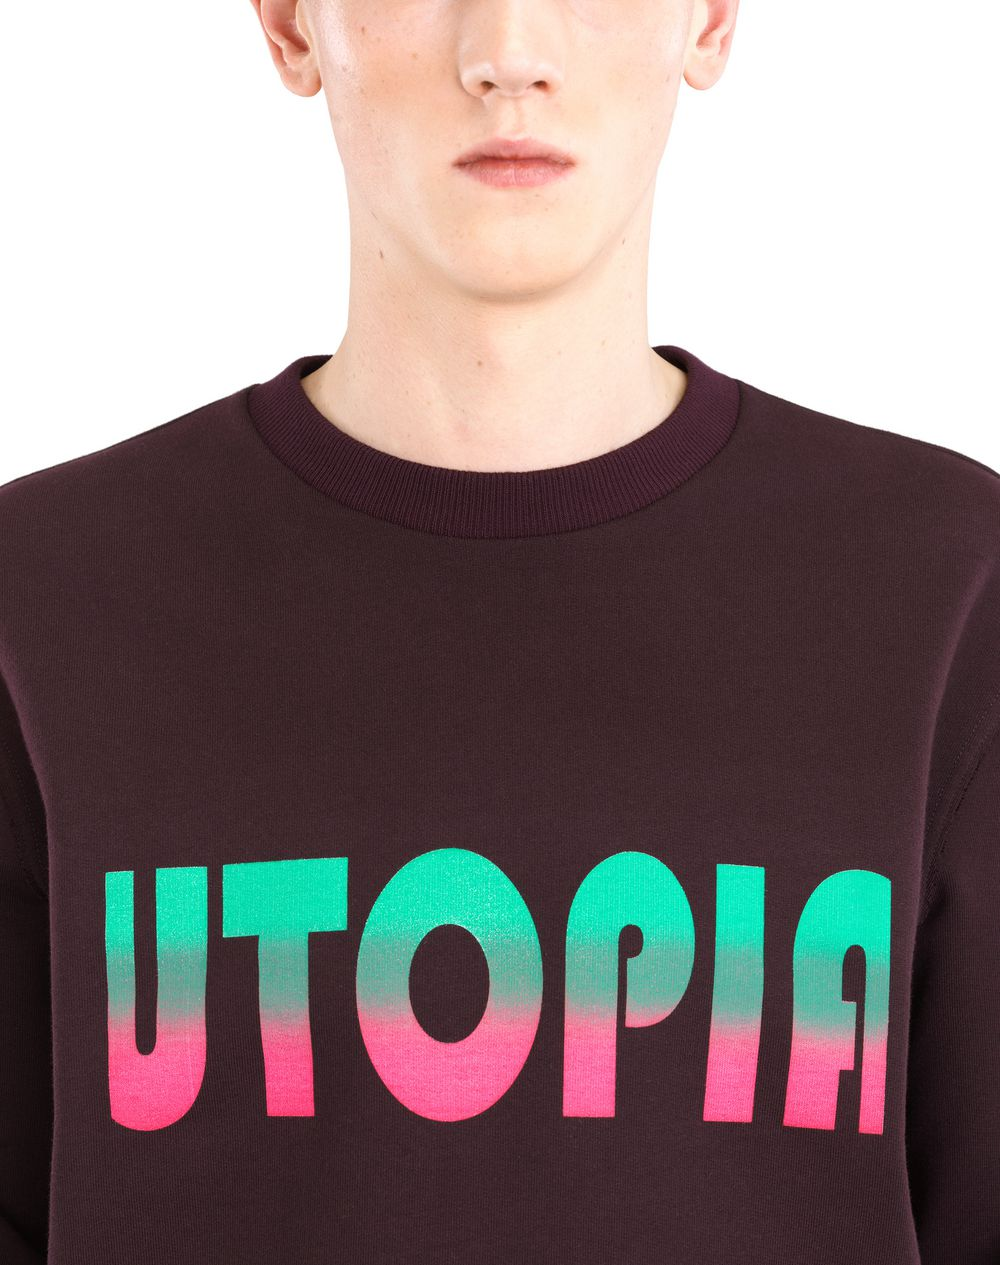 """UTOPIA"" SWEATSHIRT - Lanvin"